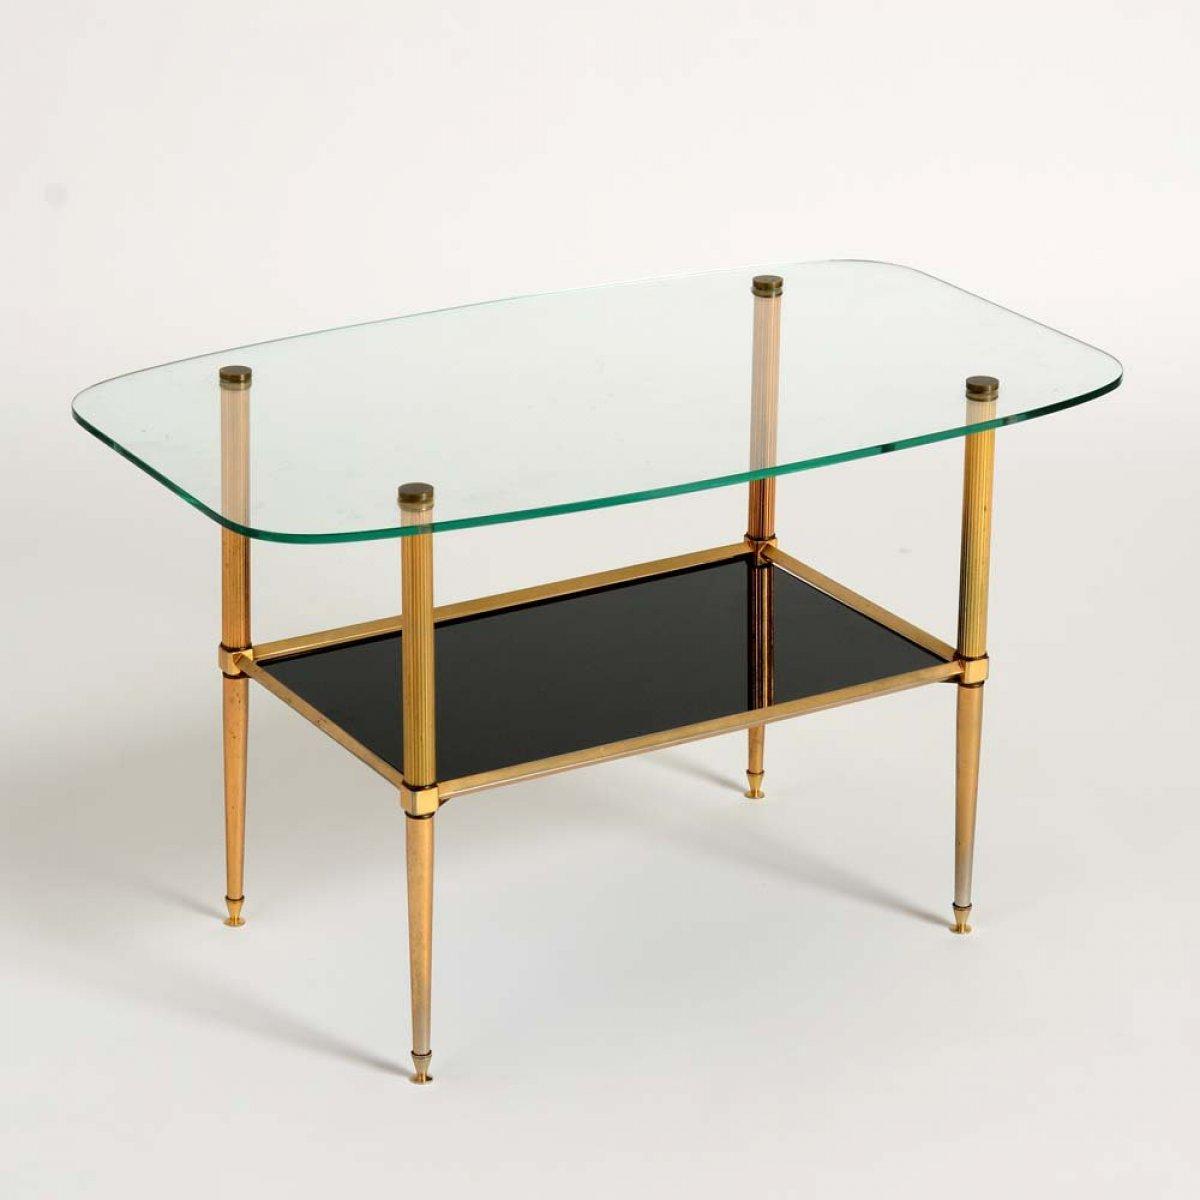 Elegant French side table